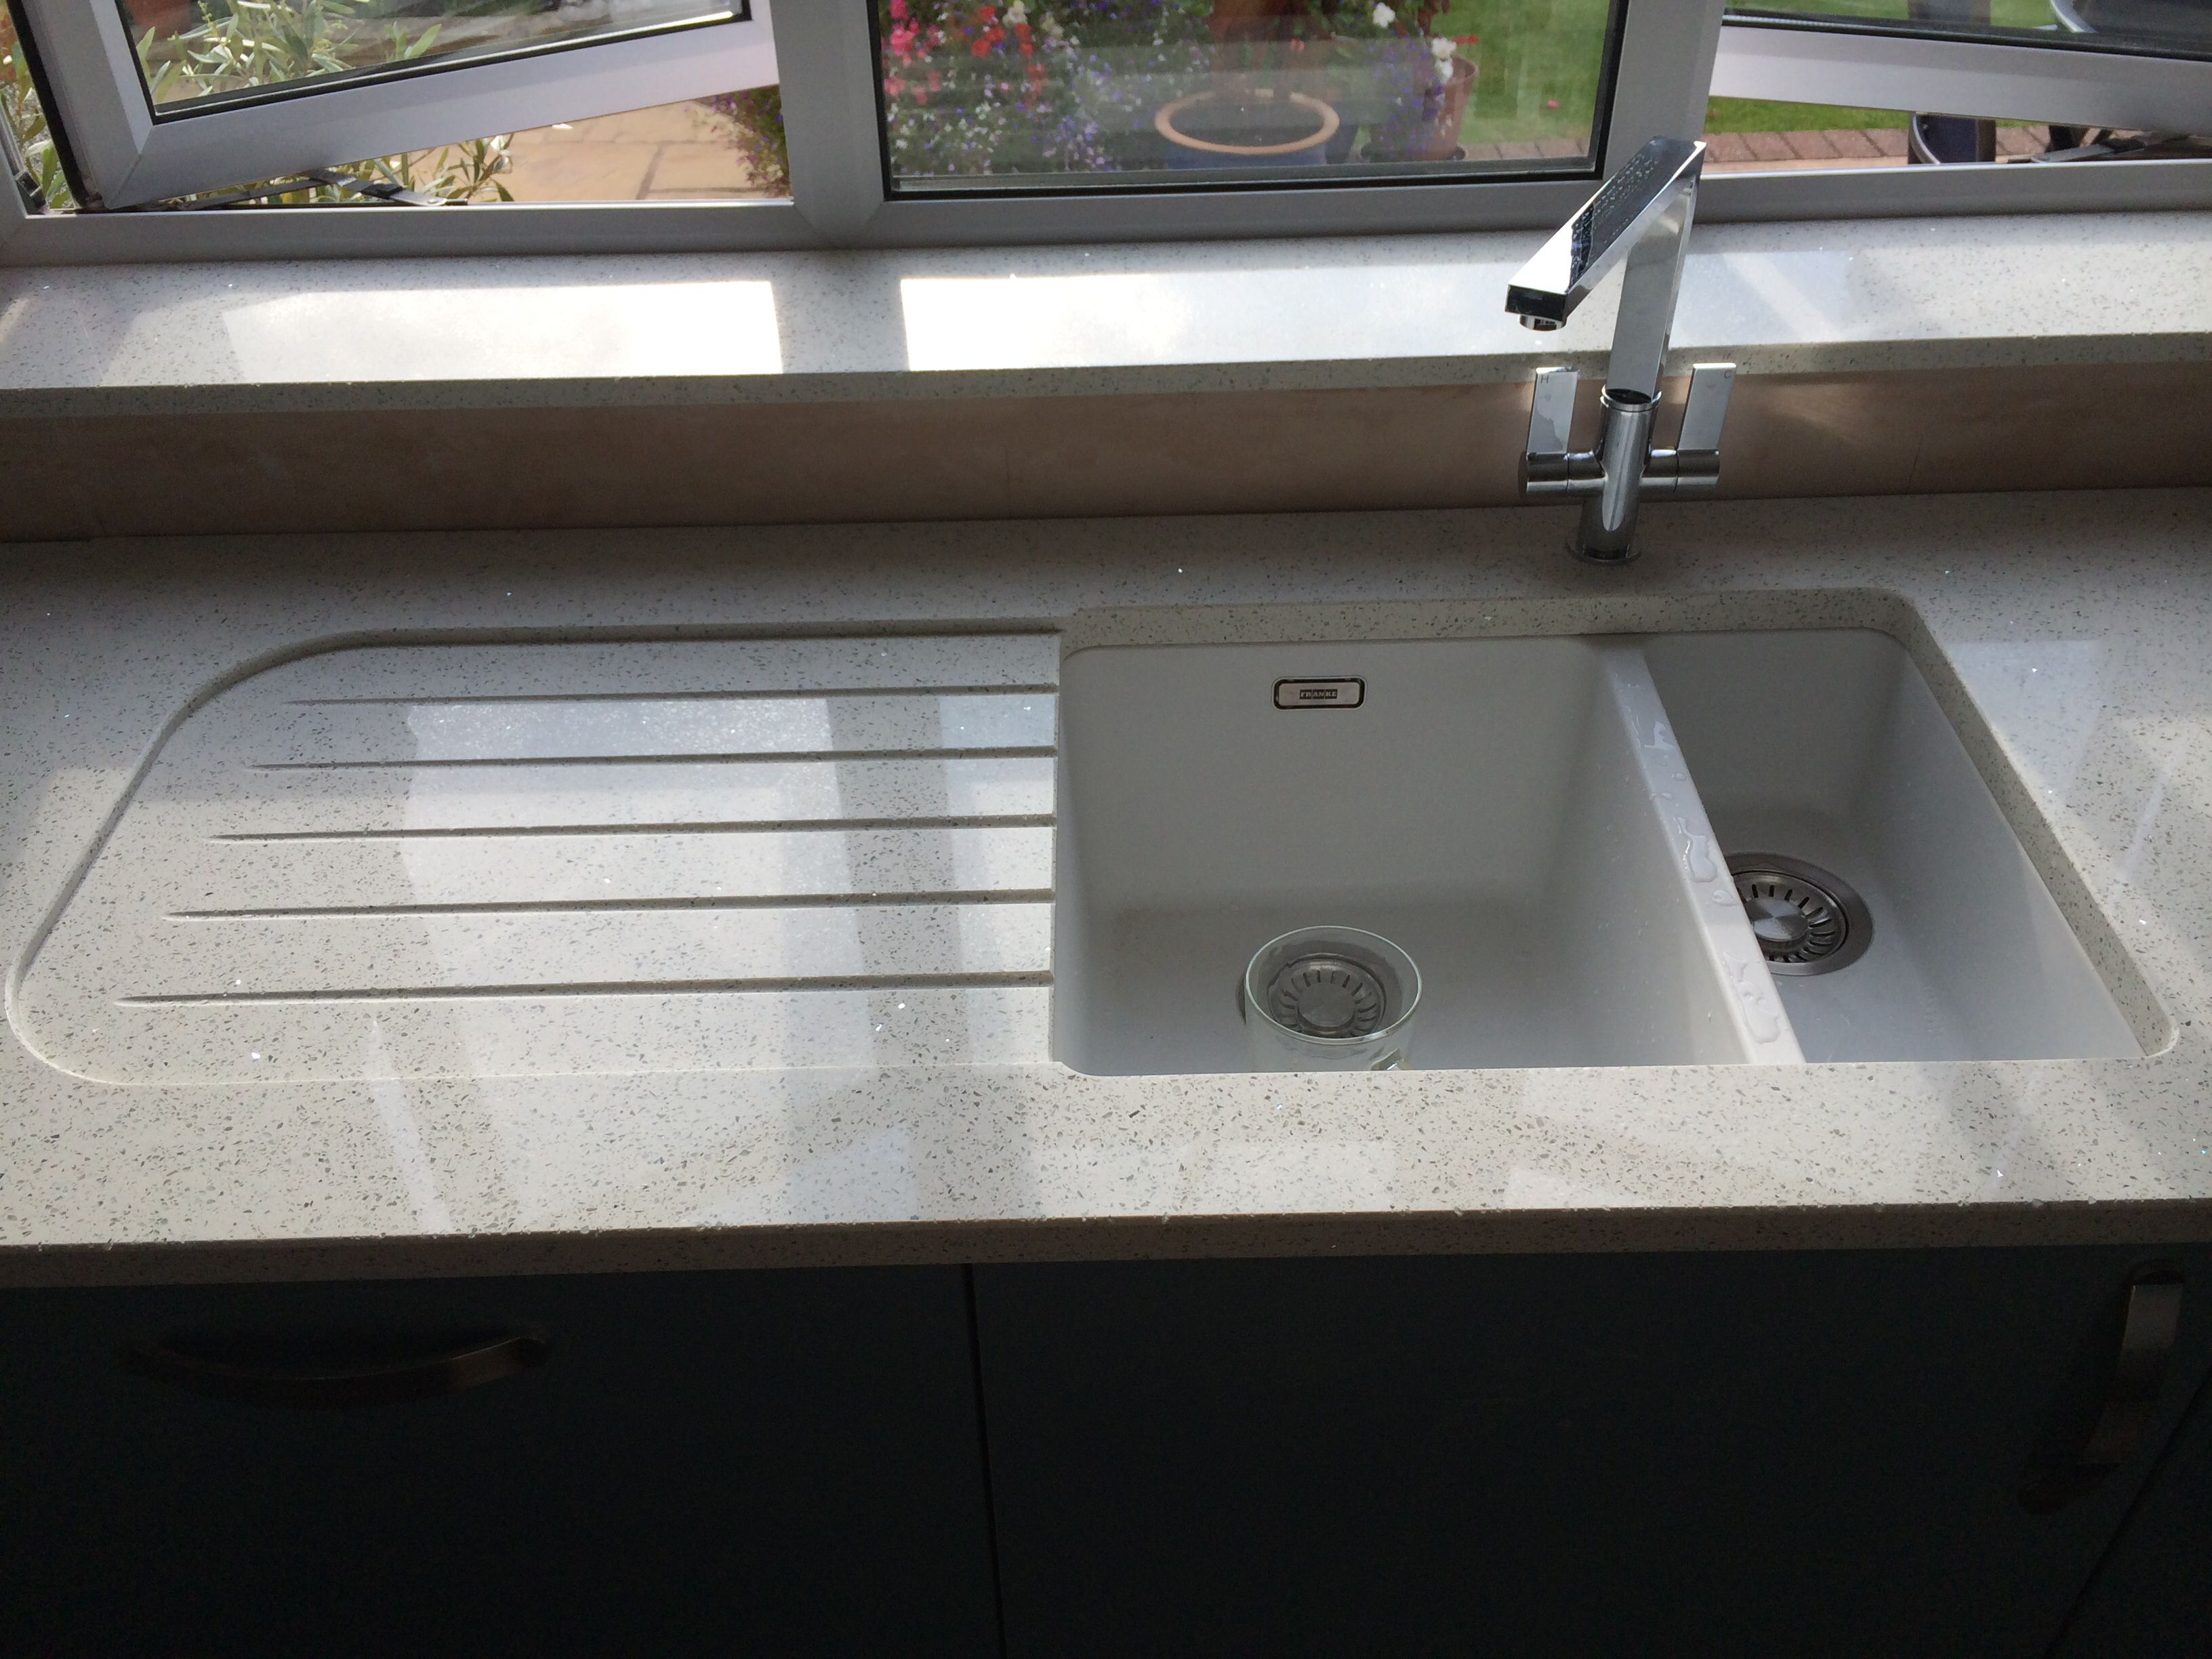 Franke Kubos Sink With Recessed Drainer In Quartz Worktop Kitchen Sink Drainers Corian Kitchen Countertops Kitchen Worktop